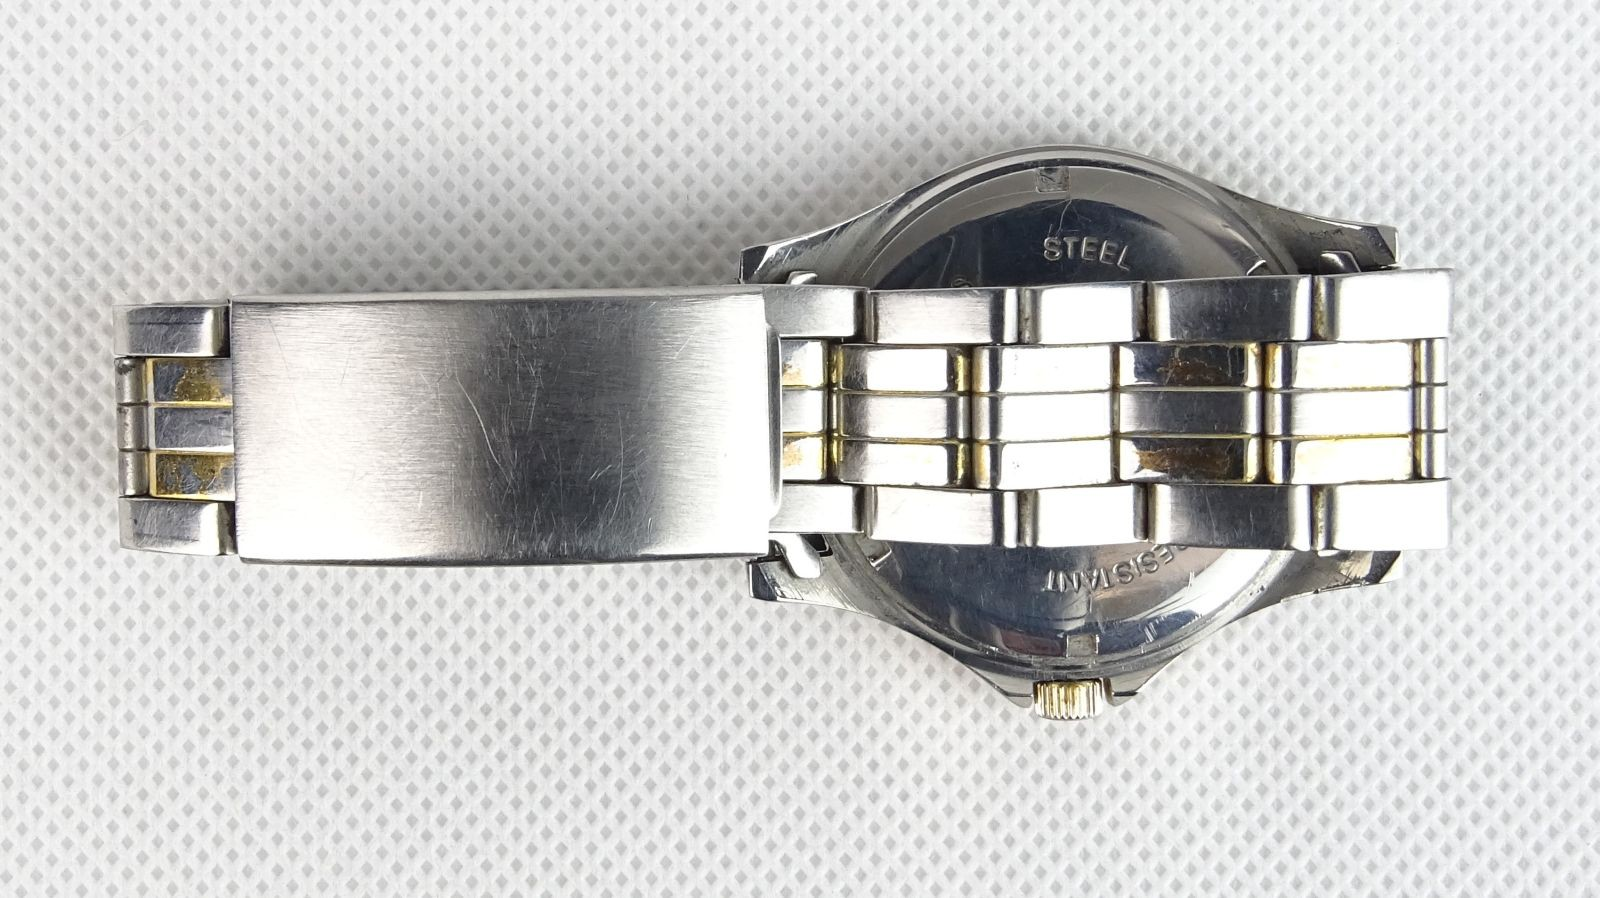 DSC08419.JPG (1600×898)